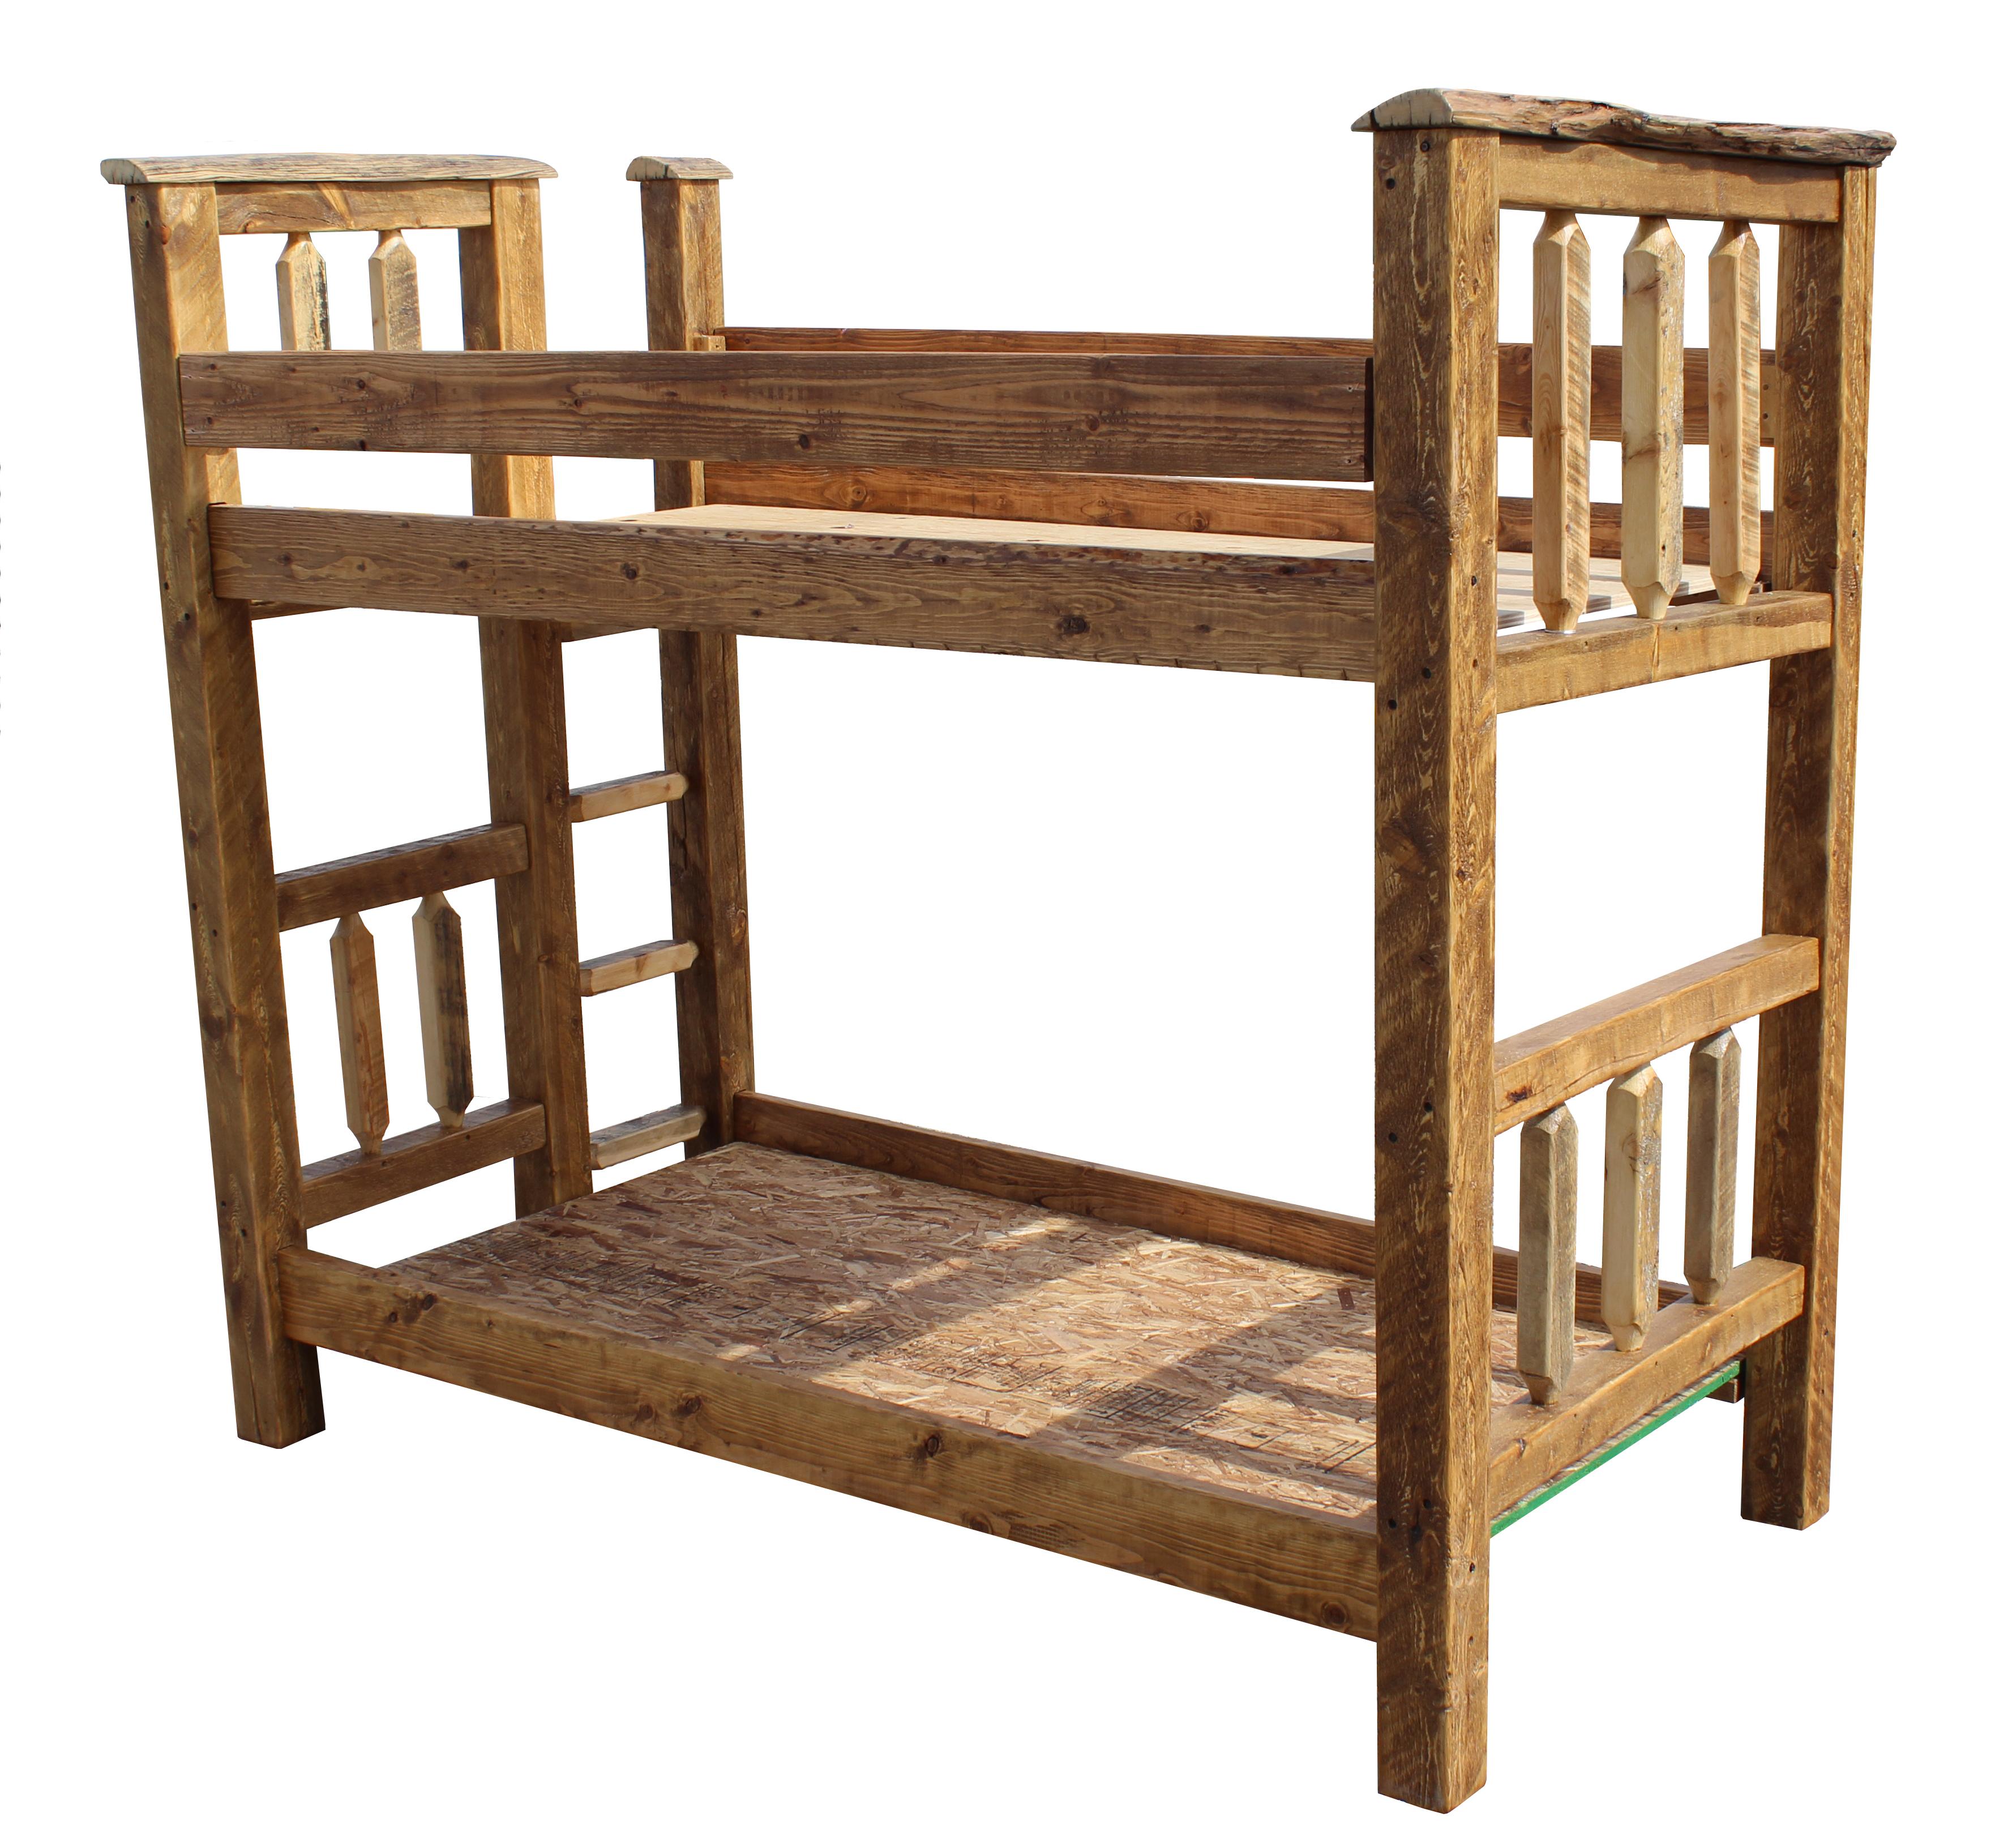 Barn Wood Bunk Bed Tenon Twin Over Twin Breck Bears